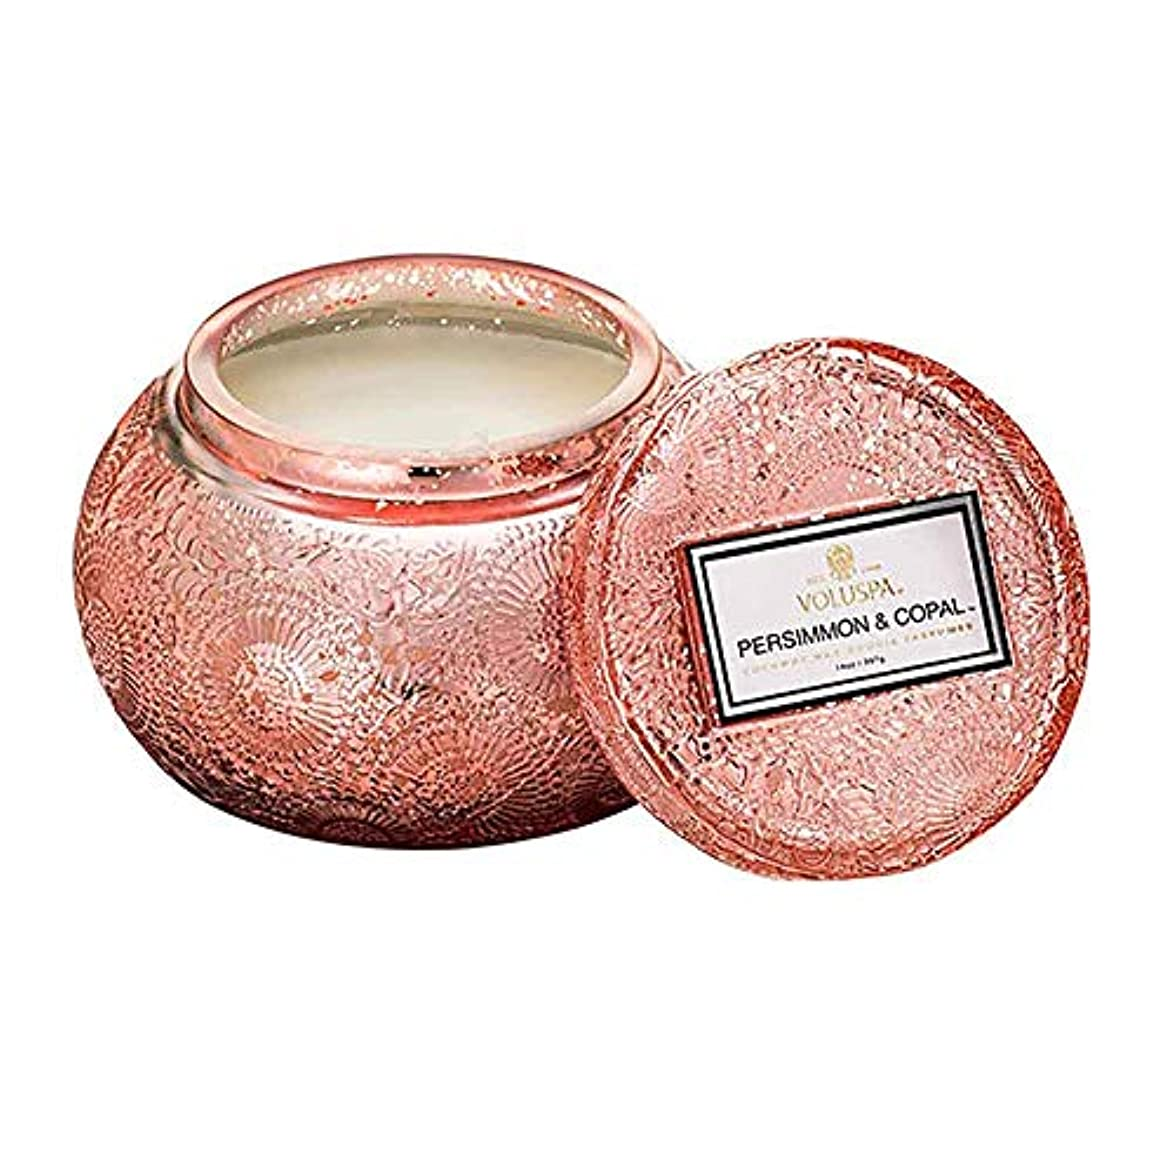 VOLUSPA チャワングラスキャンドル Persimmon & Copal パーシモン&コーパル GLASS CANDLE ボルスパ